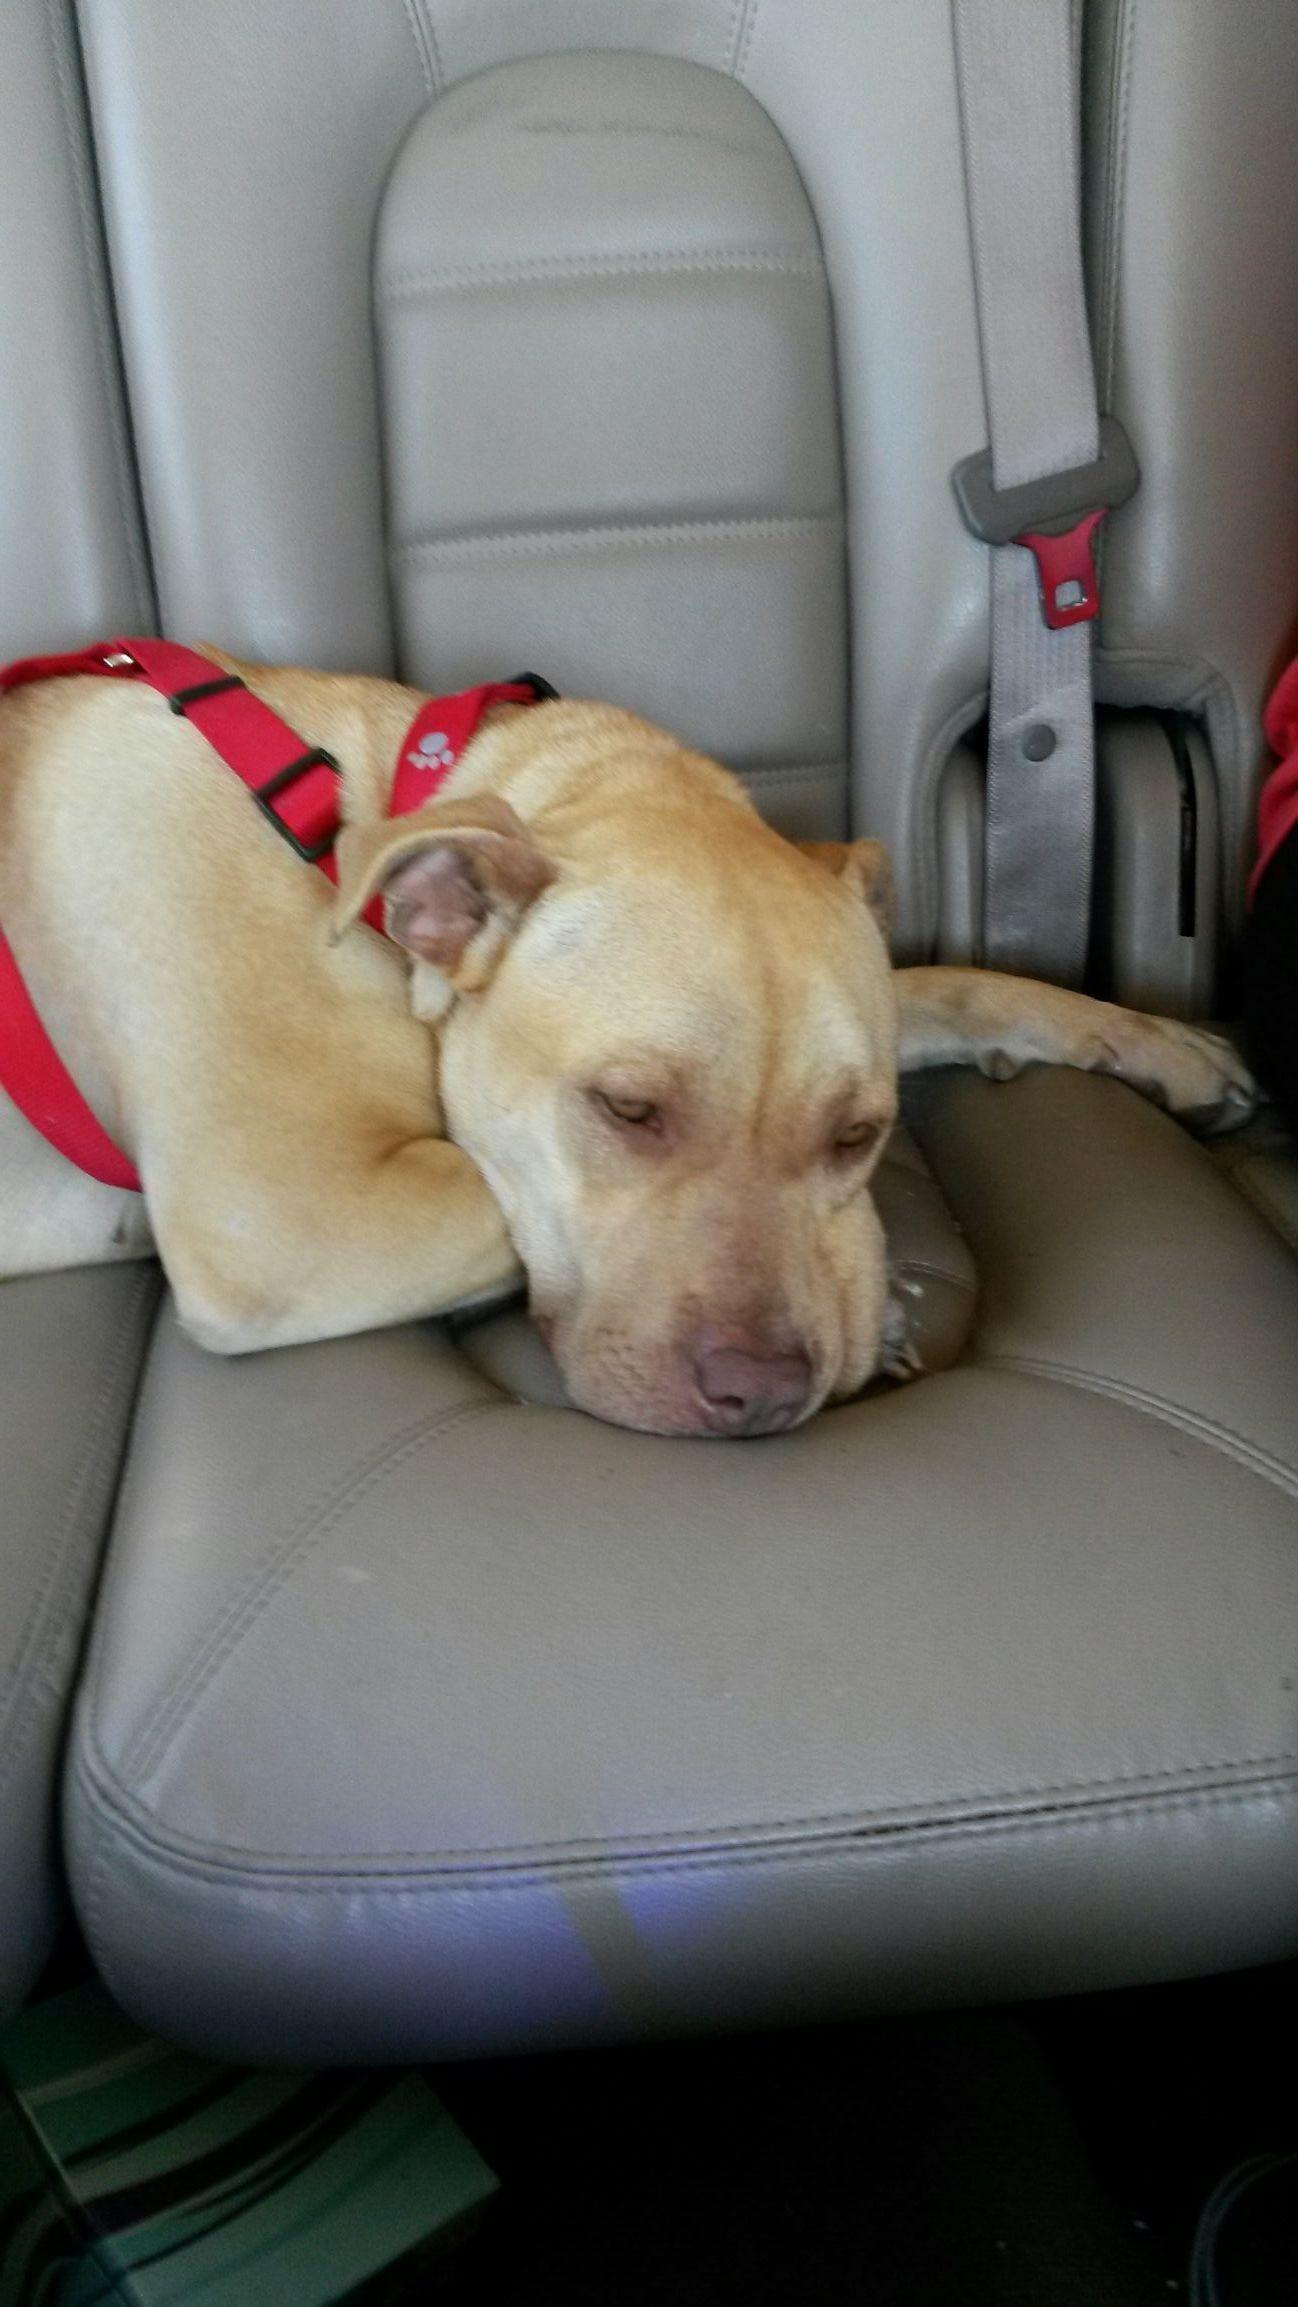 First car ride